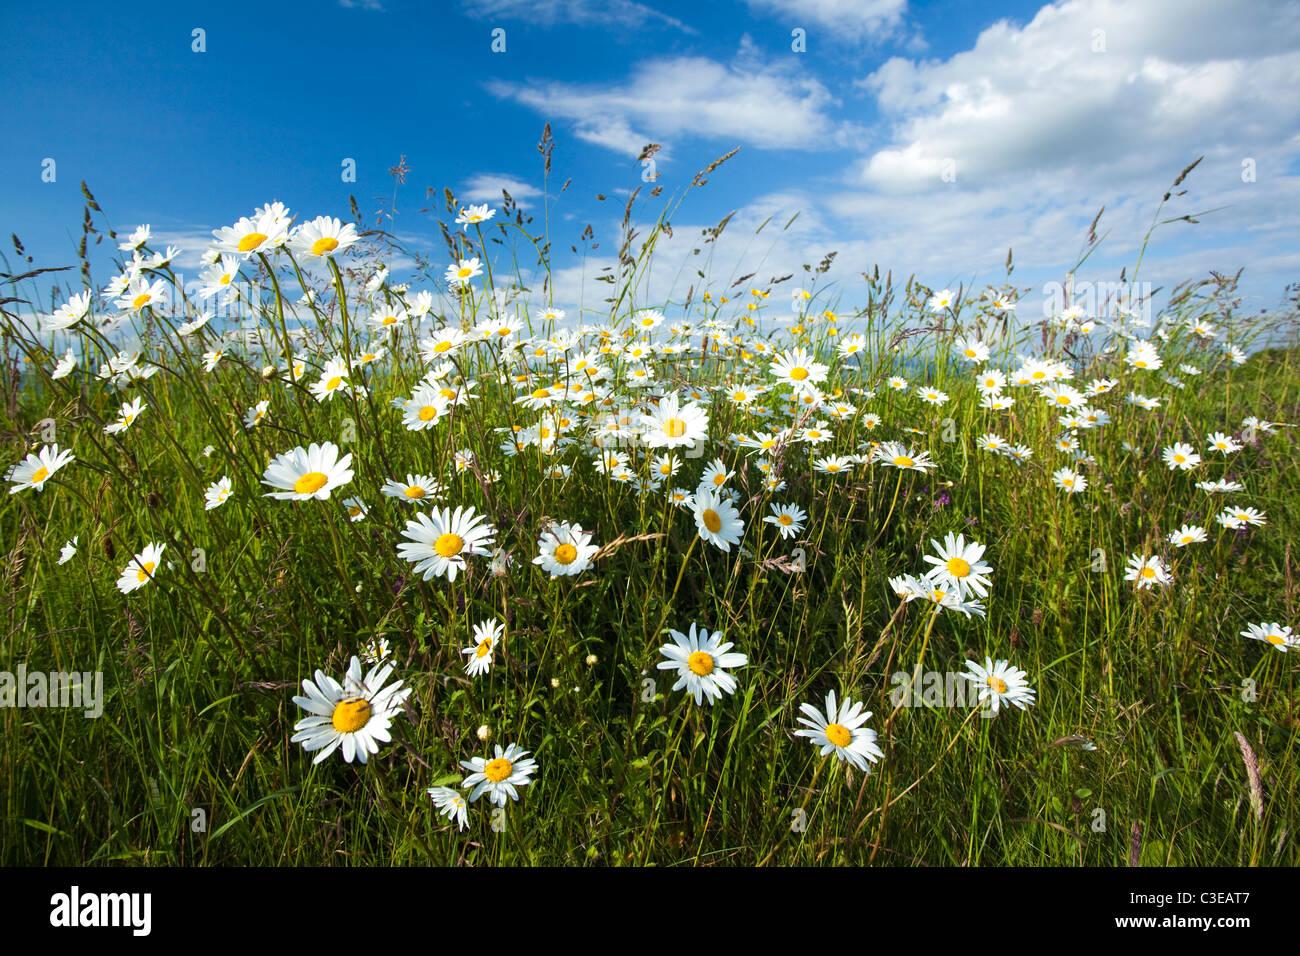 Bank of ox-eye daisies (leucanthemum vulgare), County Sligo, Ireland. Stock Photo